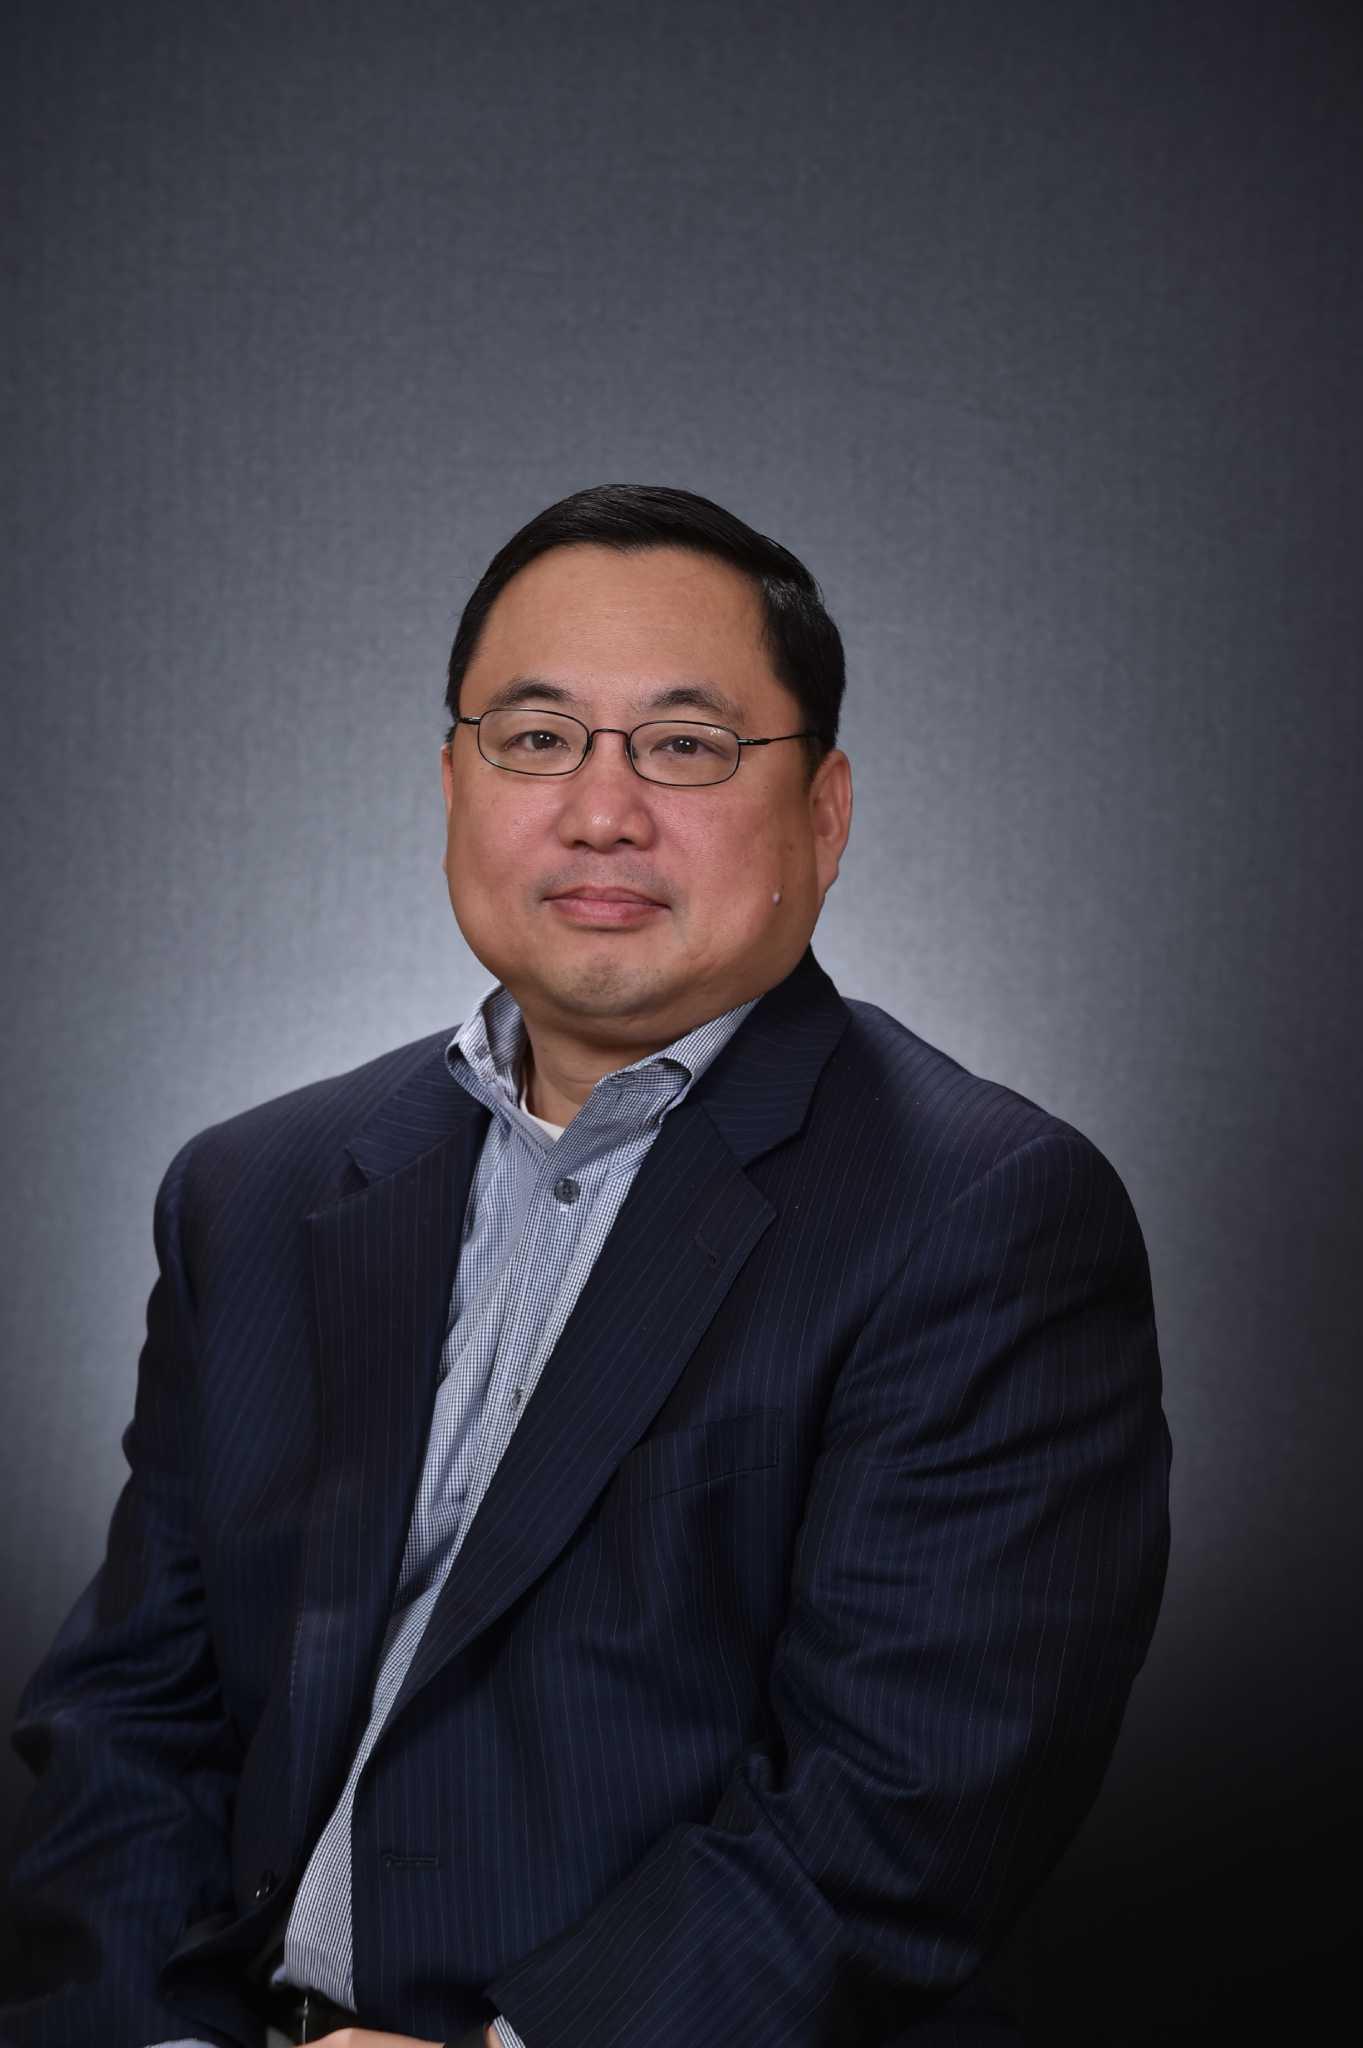 Immigrant Entrepreneurs Critical To American Economy  Houston Chronicle